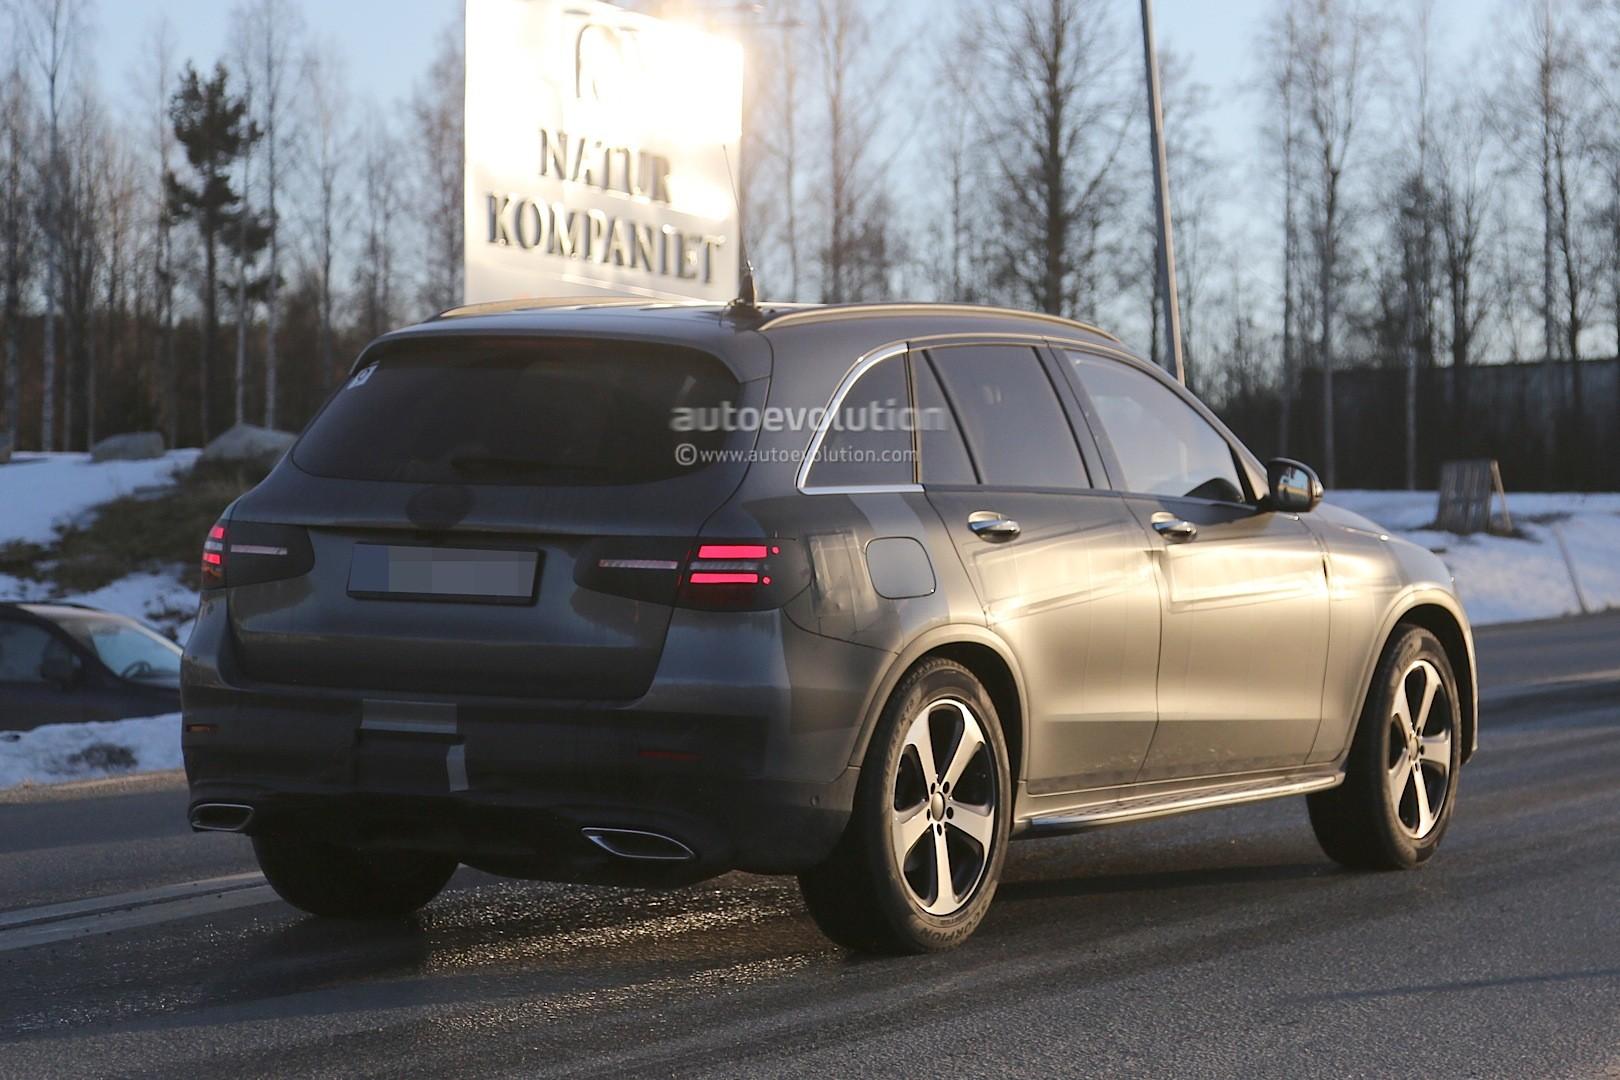 2015 - [Mercedes] GLC (GLK II) [X205] - Page 10 2016-mercedes-glc-spy-photos-show-nearly-undisguised-pre-production-prototypes_26